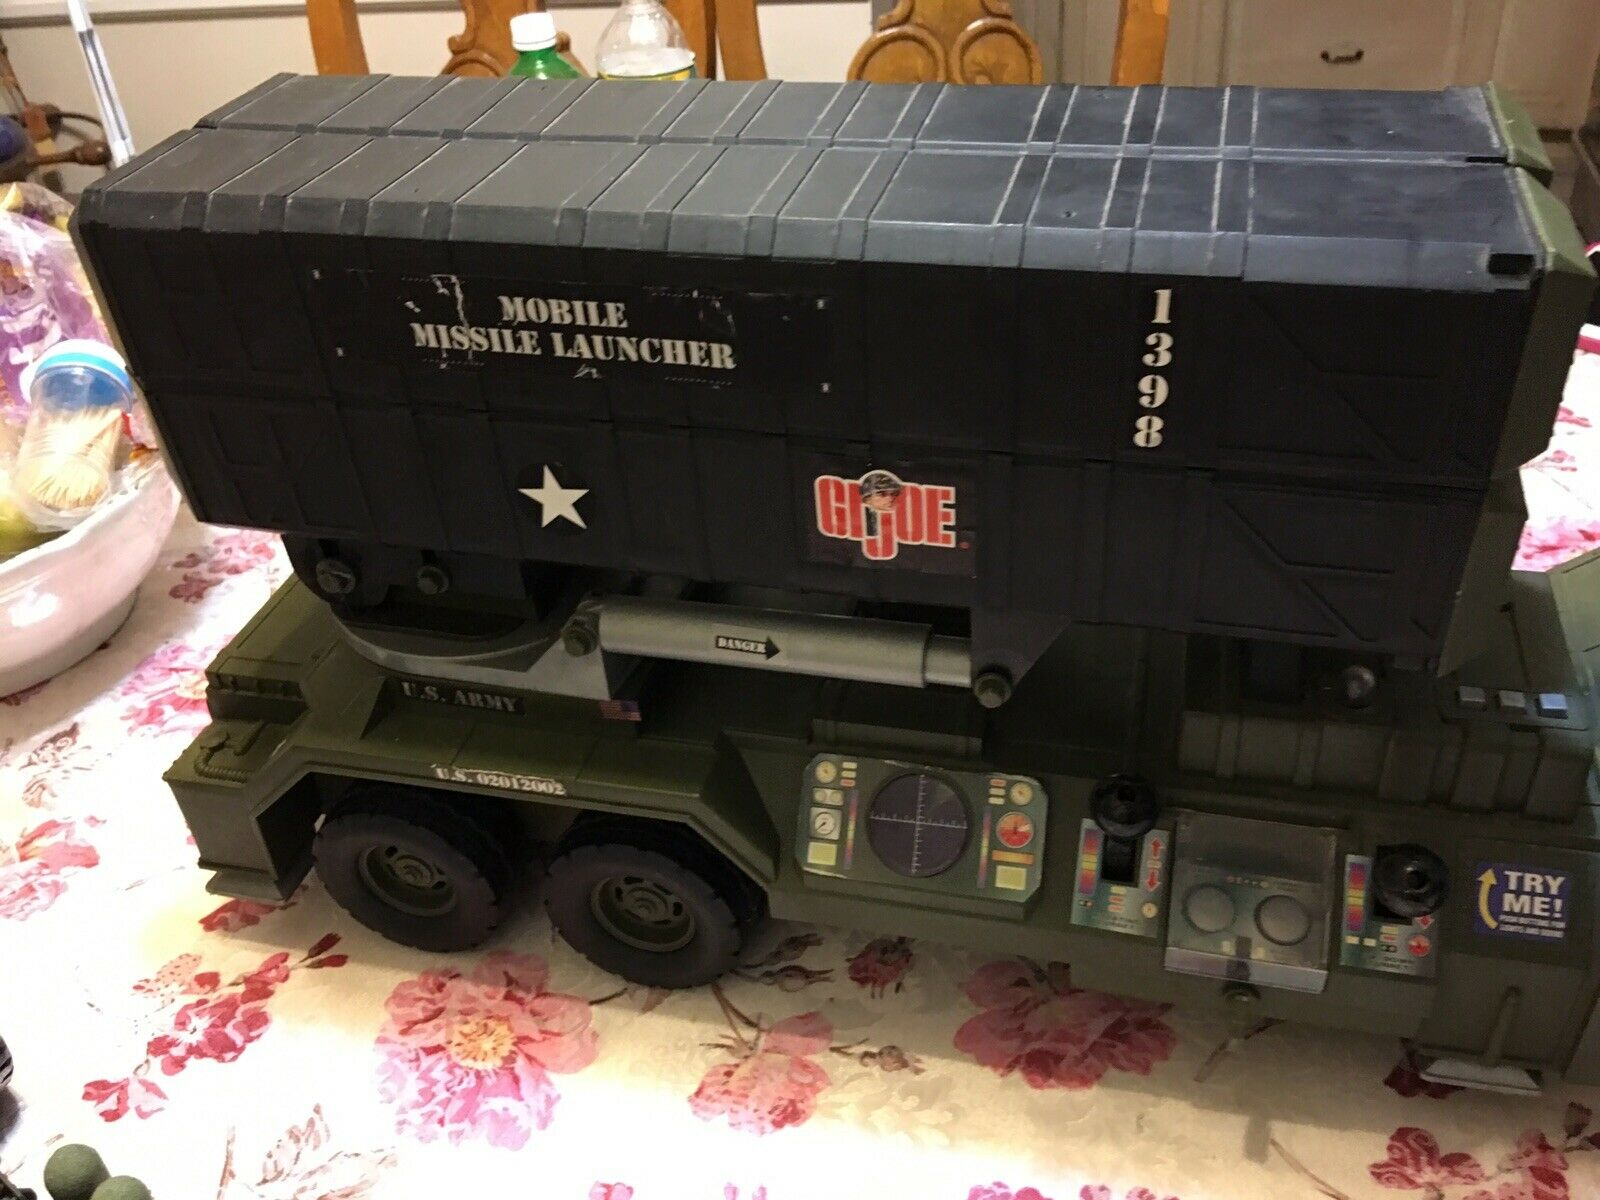 Rare G.I.Joe Mobile missle Launcher